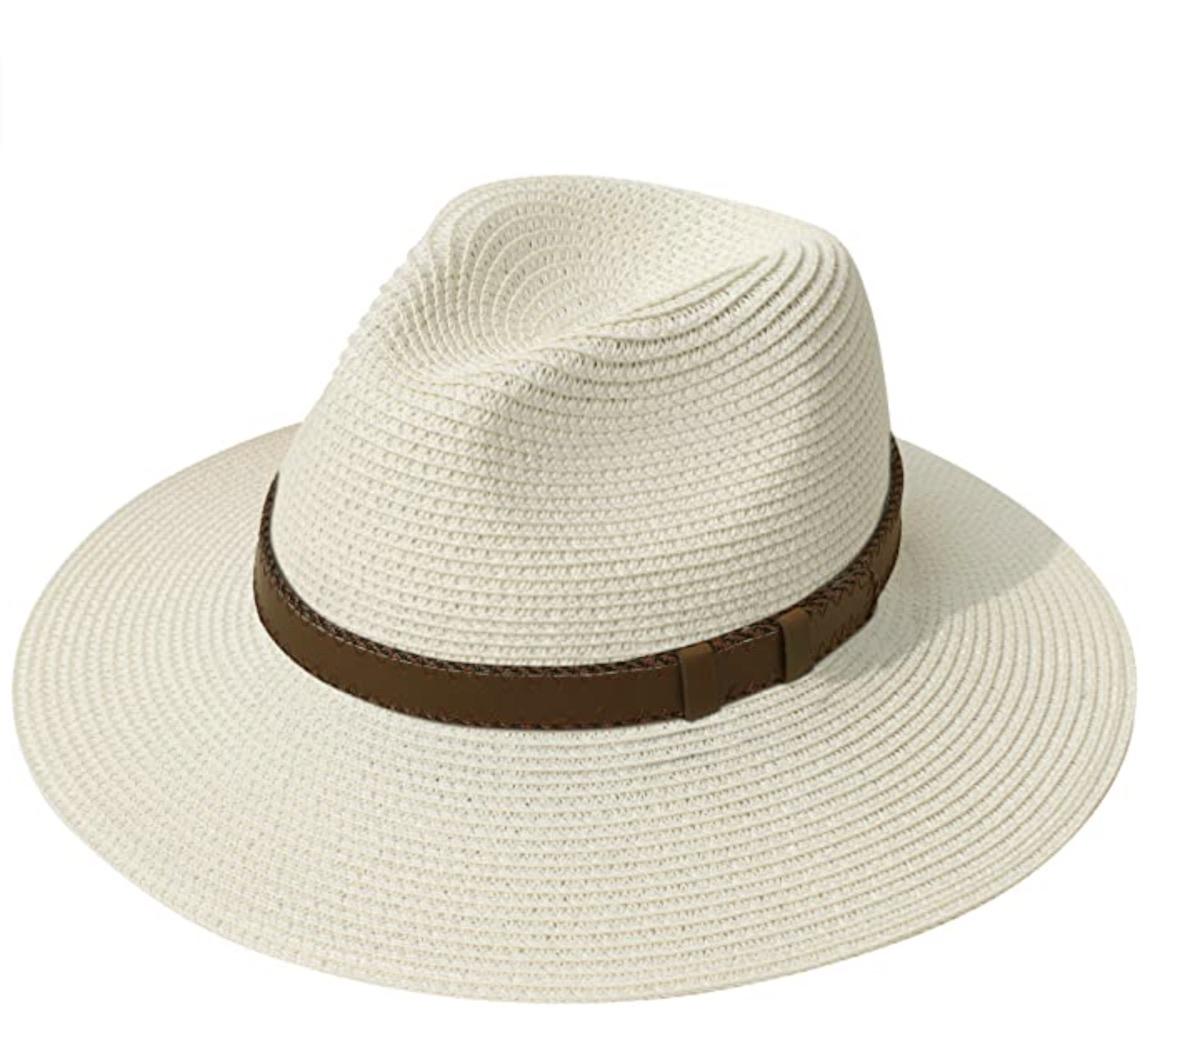 Wide Brim Straw Panama Roll up Hat Fedora Beach Sun Hat